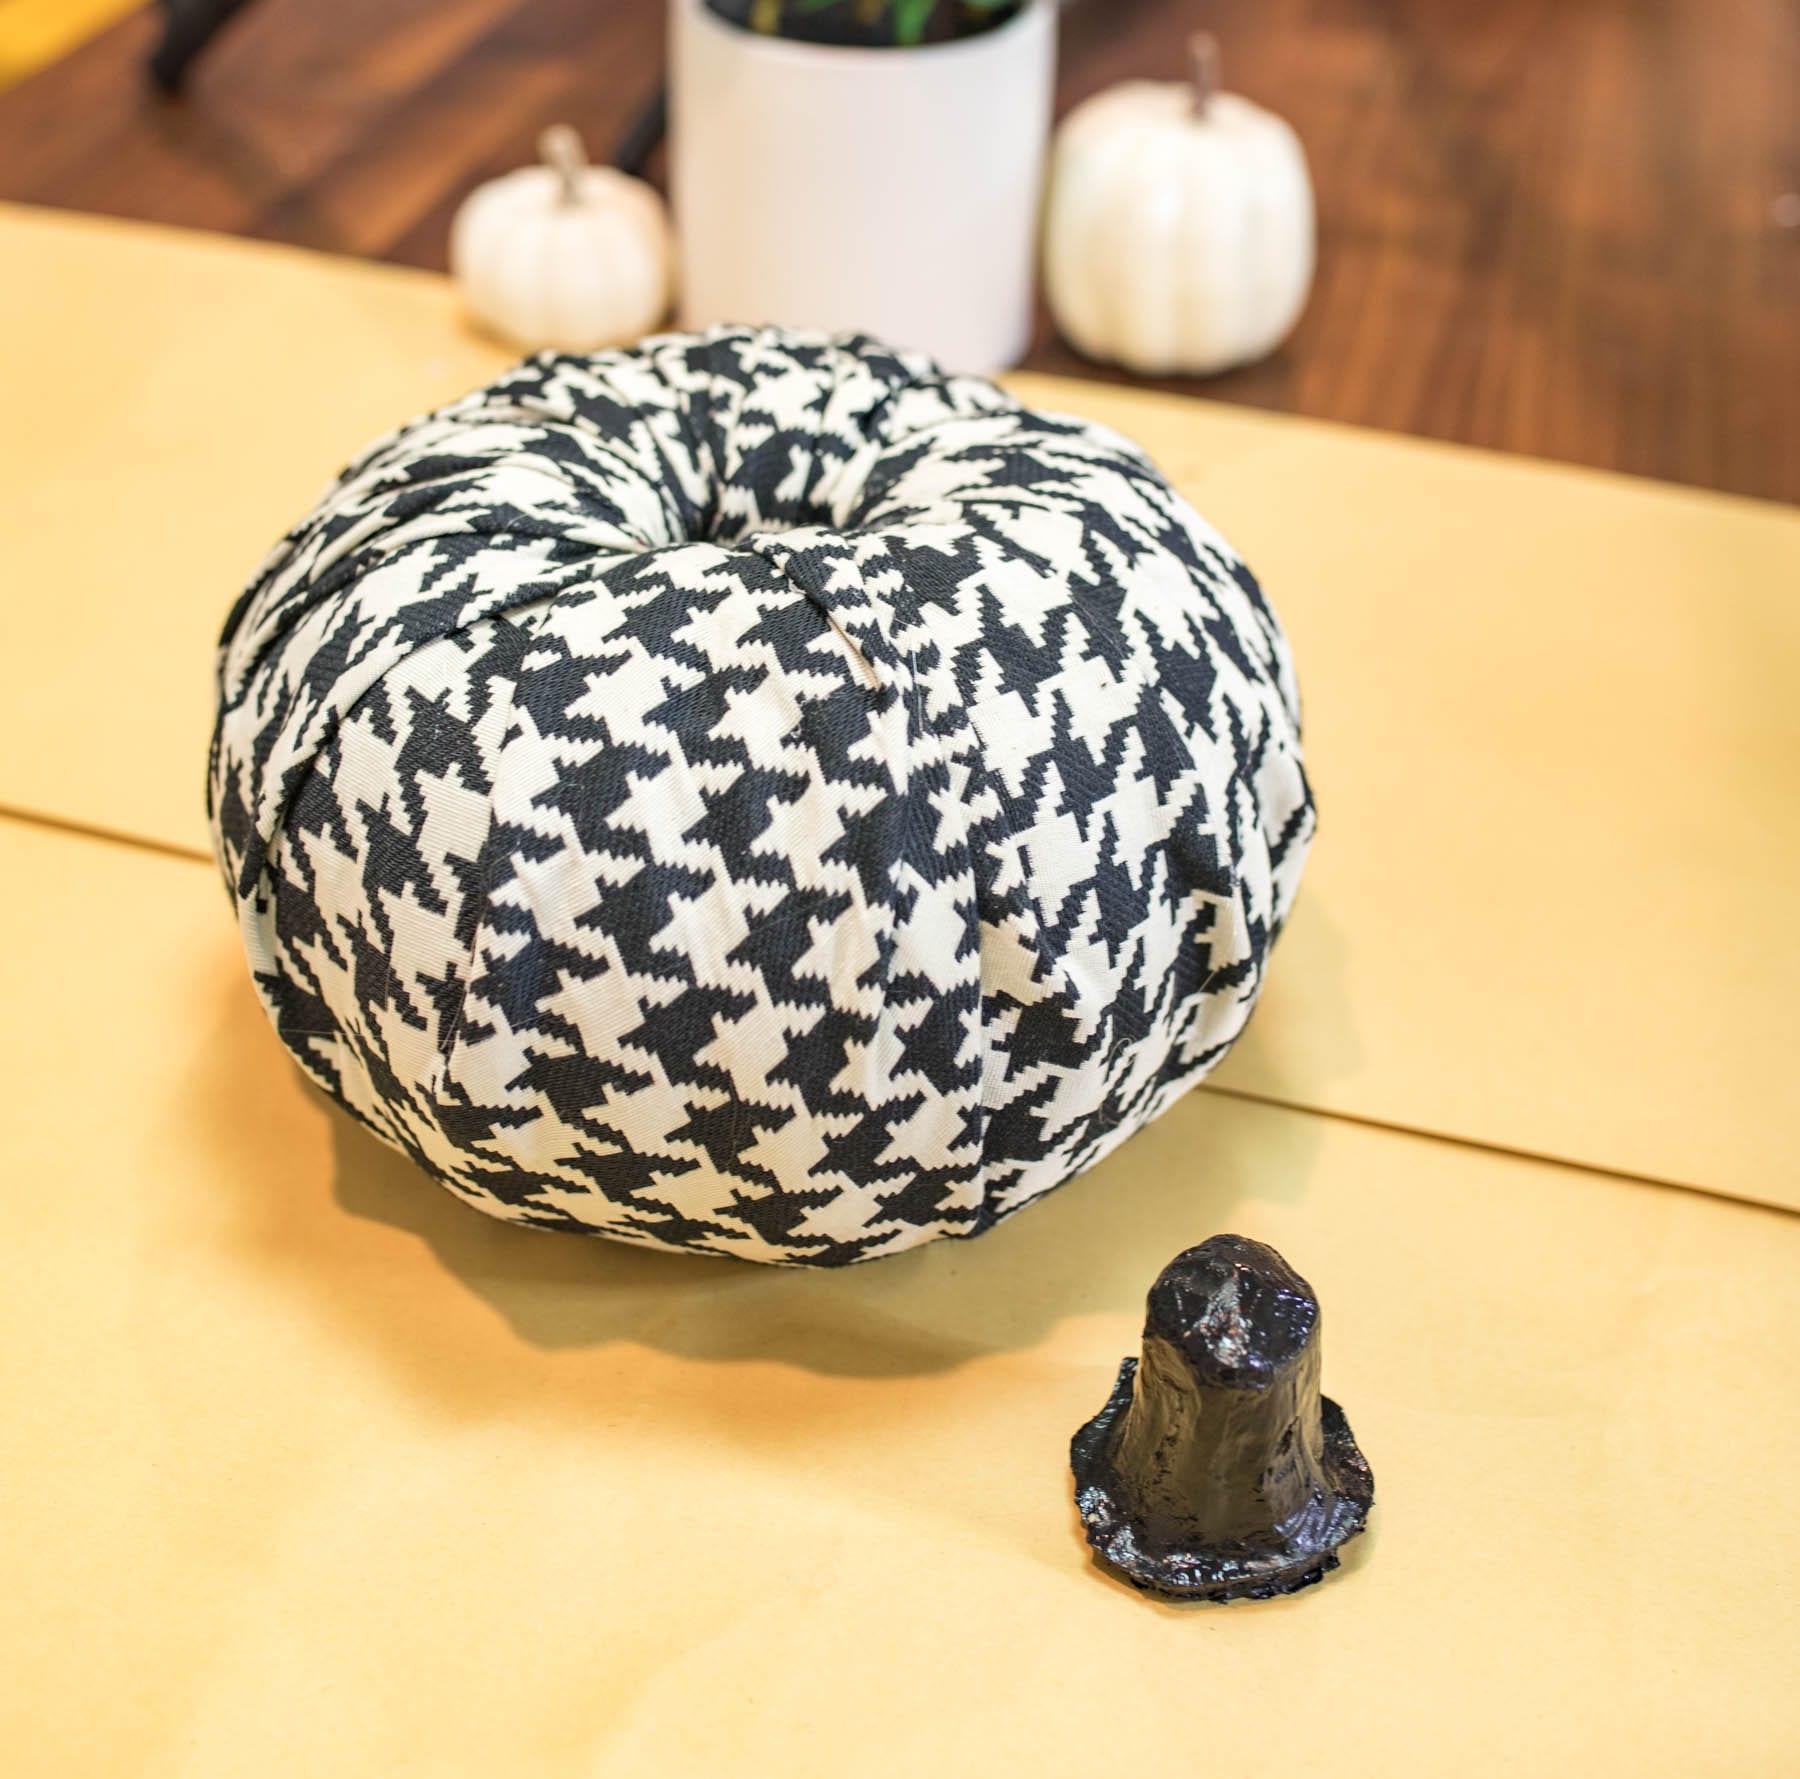 LOVE this Elegant Fabric Pumpkins Tutorial! diy fall decor | fall decor ideas diy | no sew fabric pumpkin | pumpkin decorating ideas | Never Skip Brunch by Cara Newhart | #pumpkins #diy #fall #neverskipbrunch